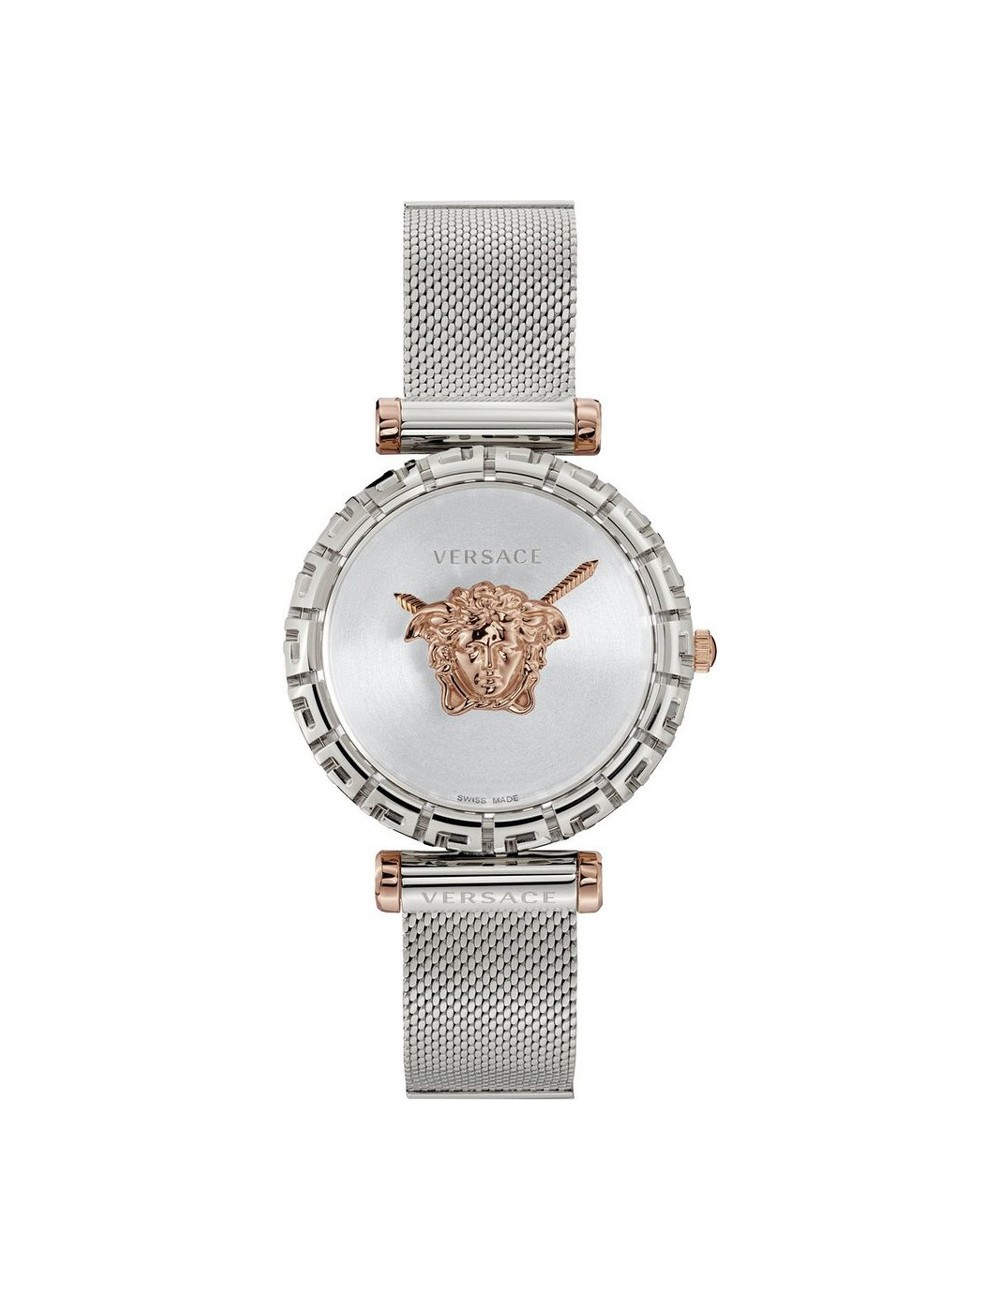 Versace VEDV00419 Palazzo Empire Ladies Watch